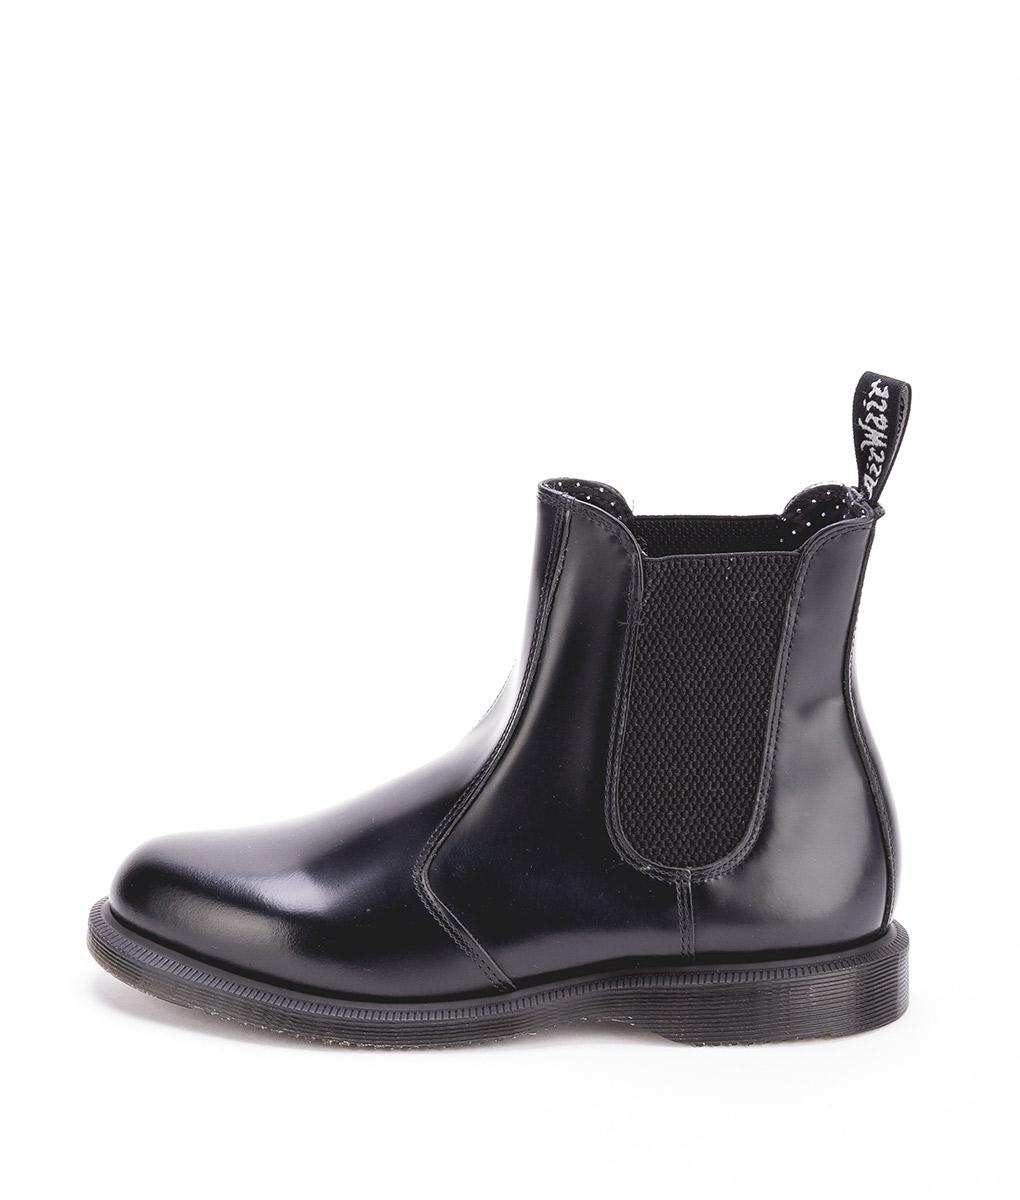 de0cf1a5a31 DR MARTENS Women Chelsea Boots FLORA 14649001, Black